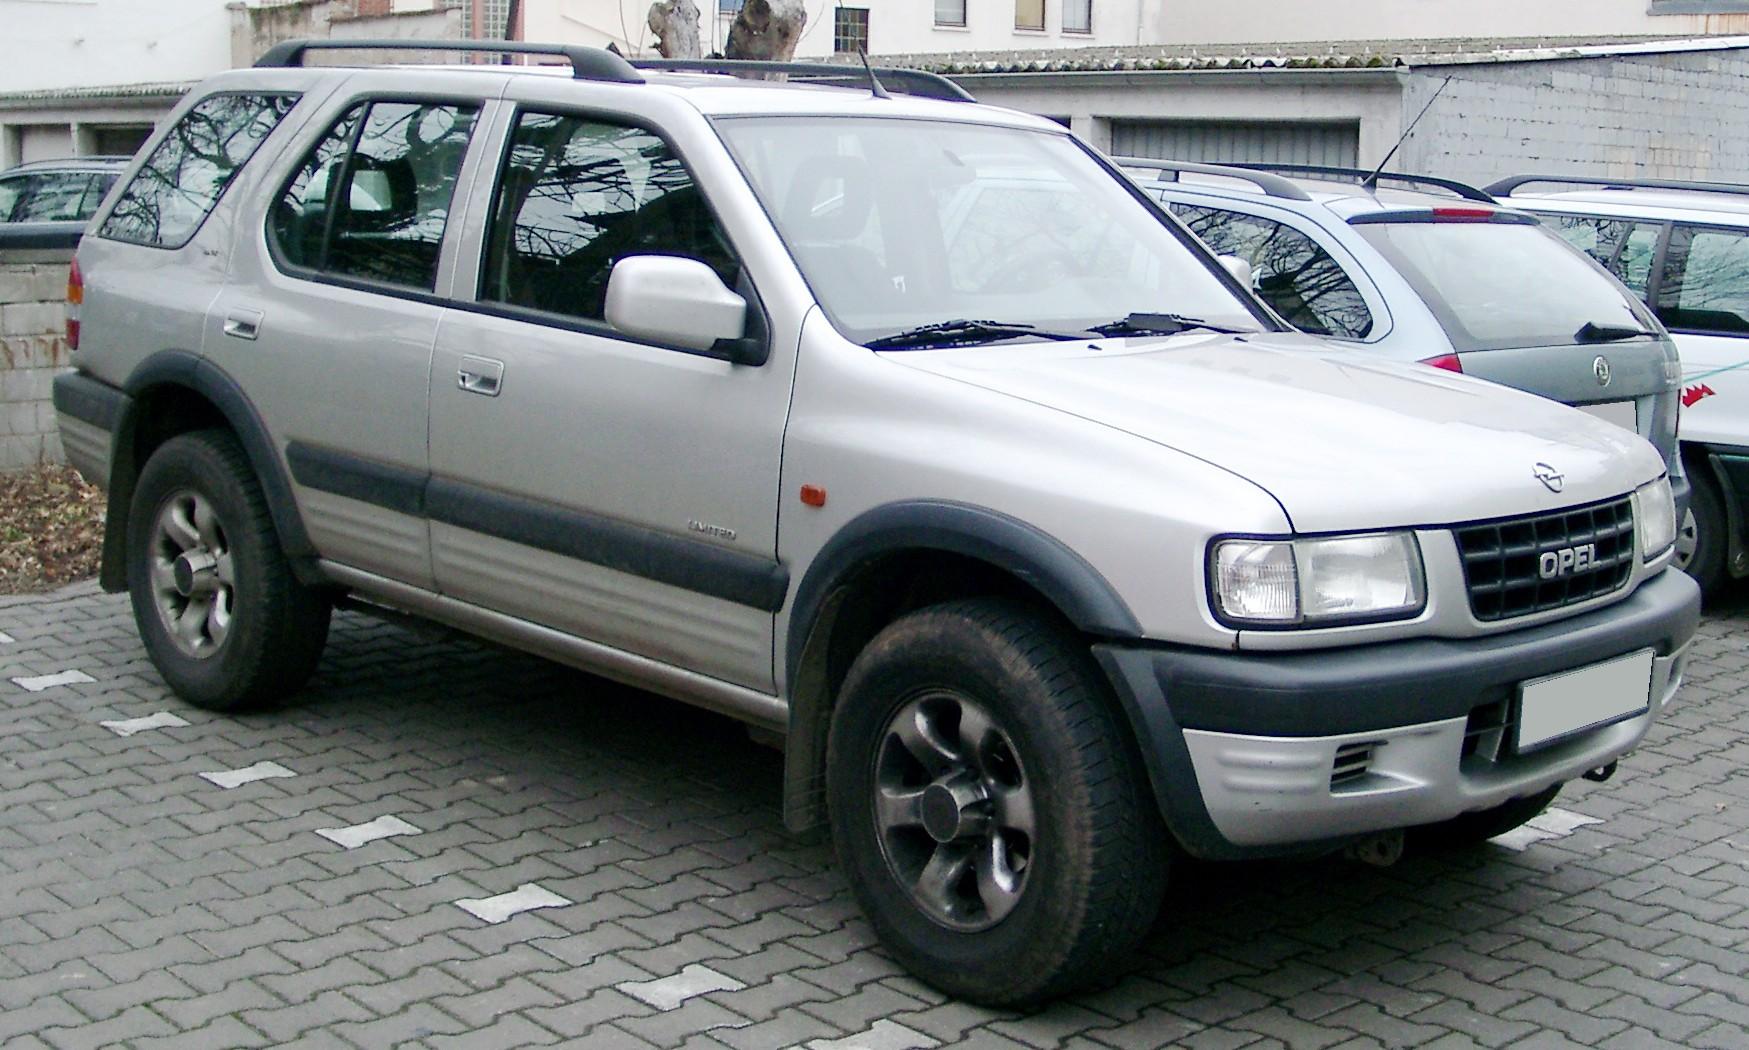 Opel Frontera B Restyling 2001 - 2004 SUV 3 door #6